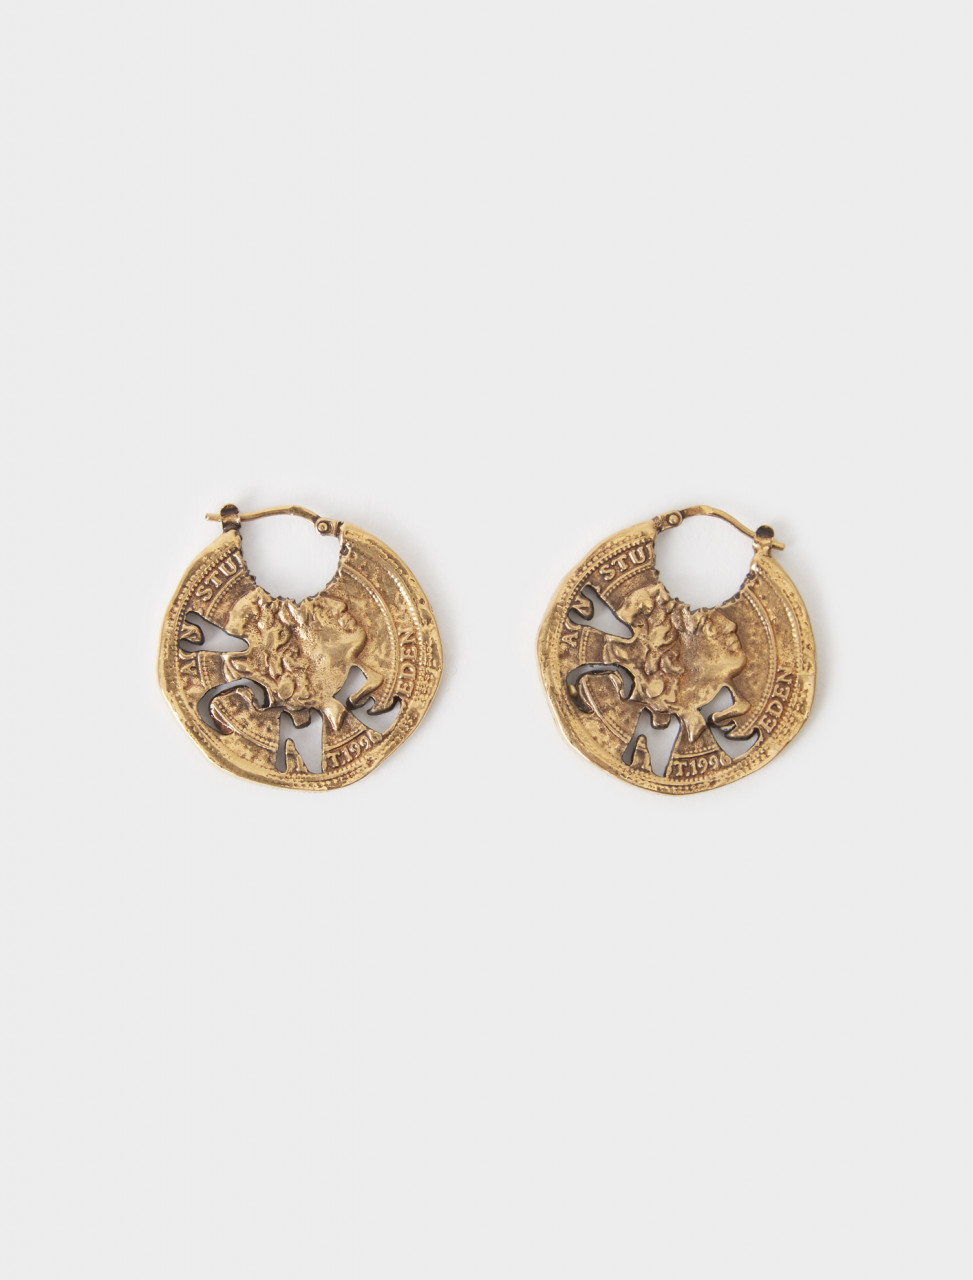 C50197-BYK ACNE STUDIOS EARRING ANTIQUE GOLD